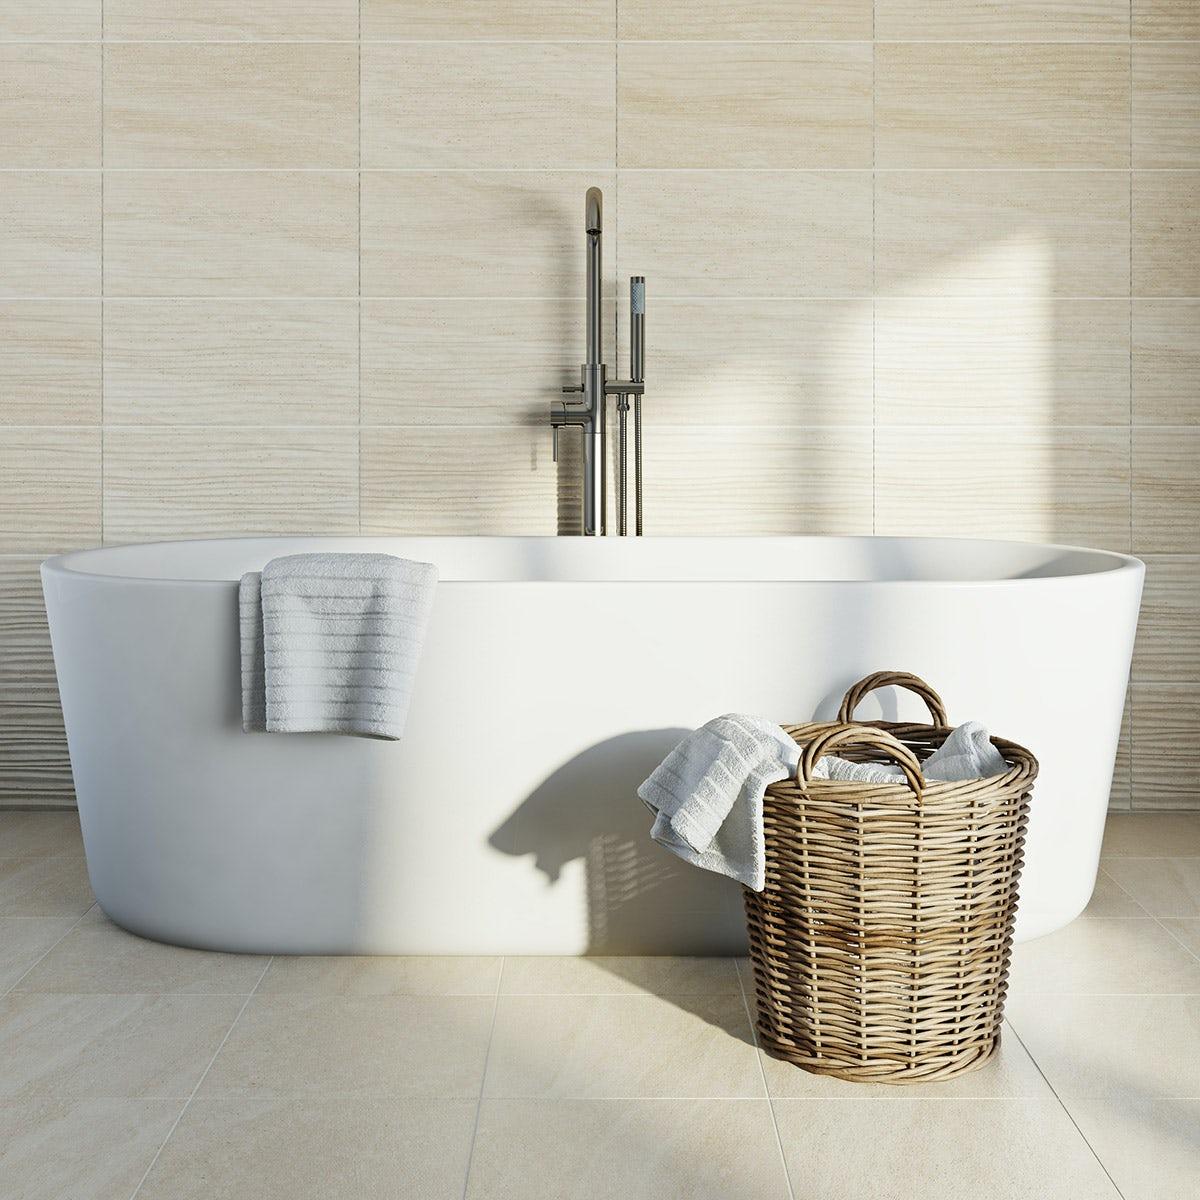 British Ceramic Tile Pumice light wave beige matt tile 248mm x 498mm